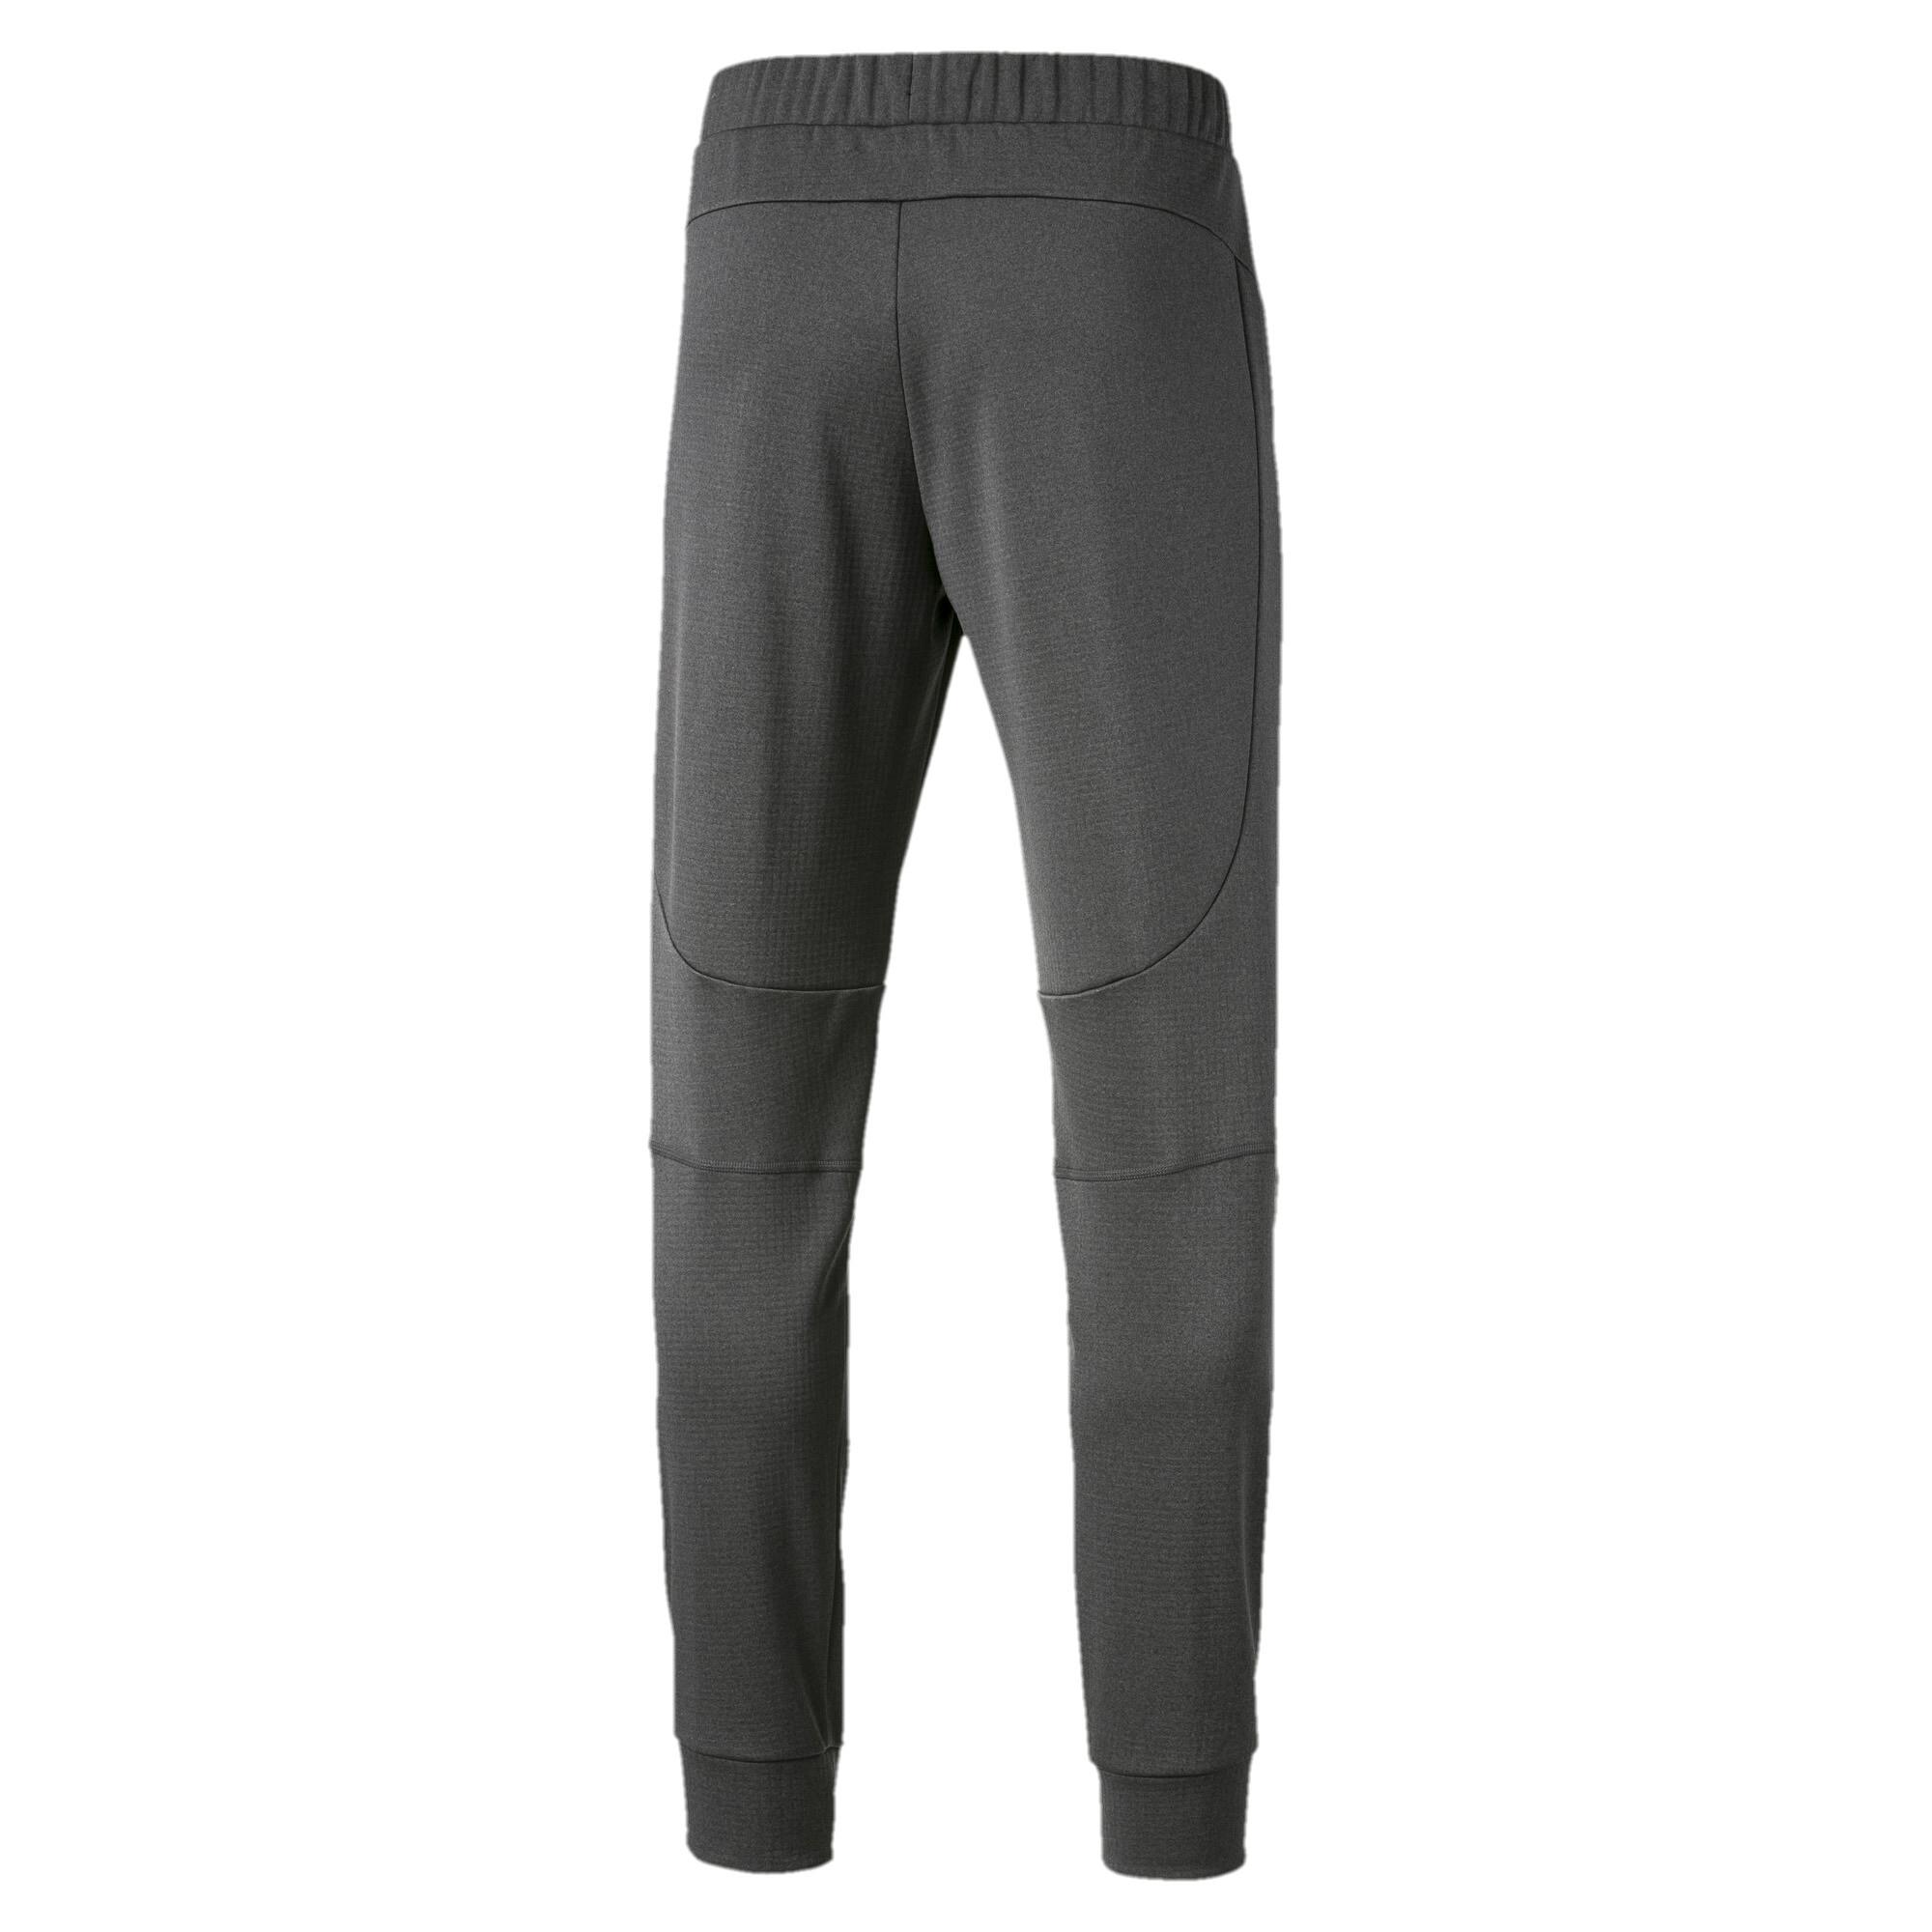 PUMA-Evostripe-Warm-Men-039-s-Pants-Men-Knitted-Pants-Basics miniatura 3